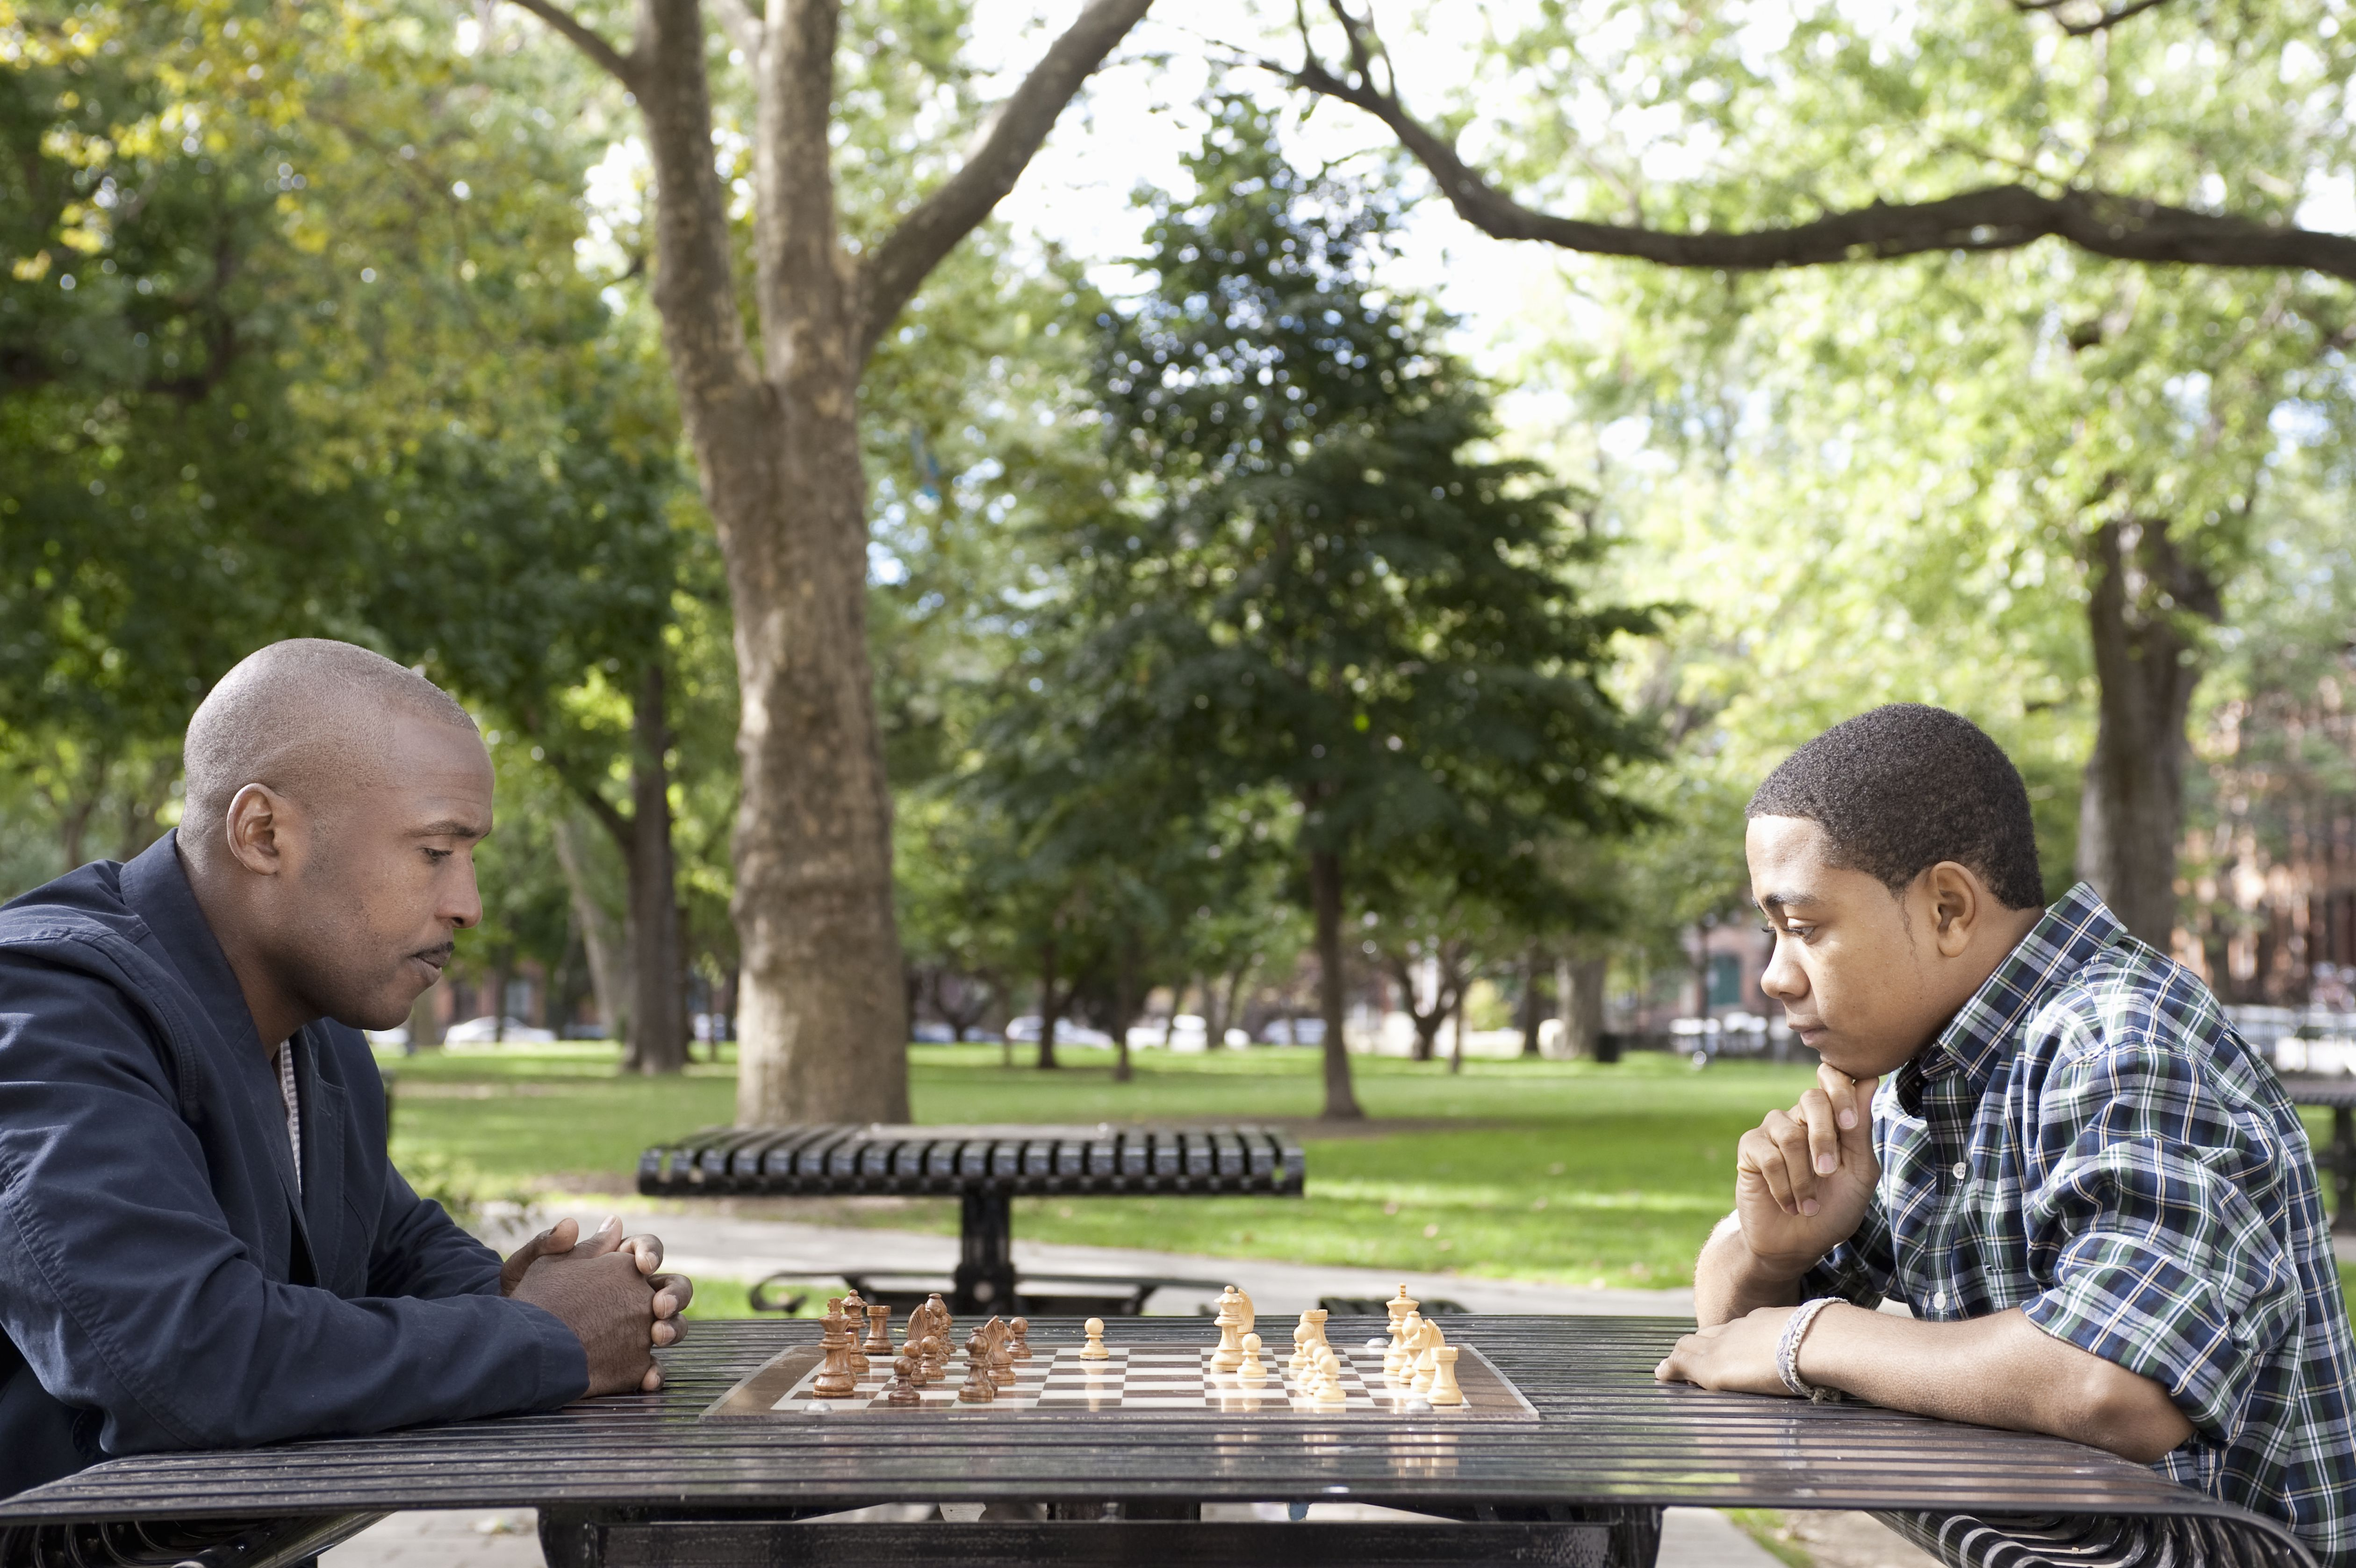 Teen Boy and Senior Man Playing Chess